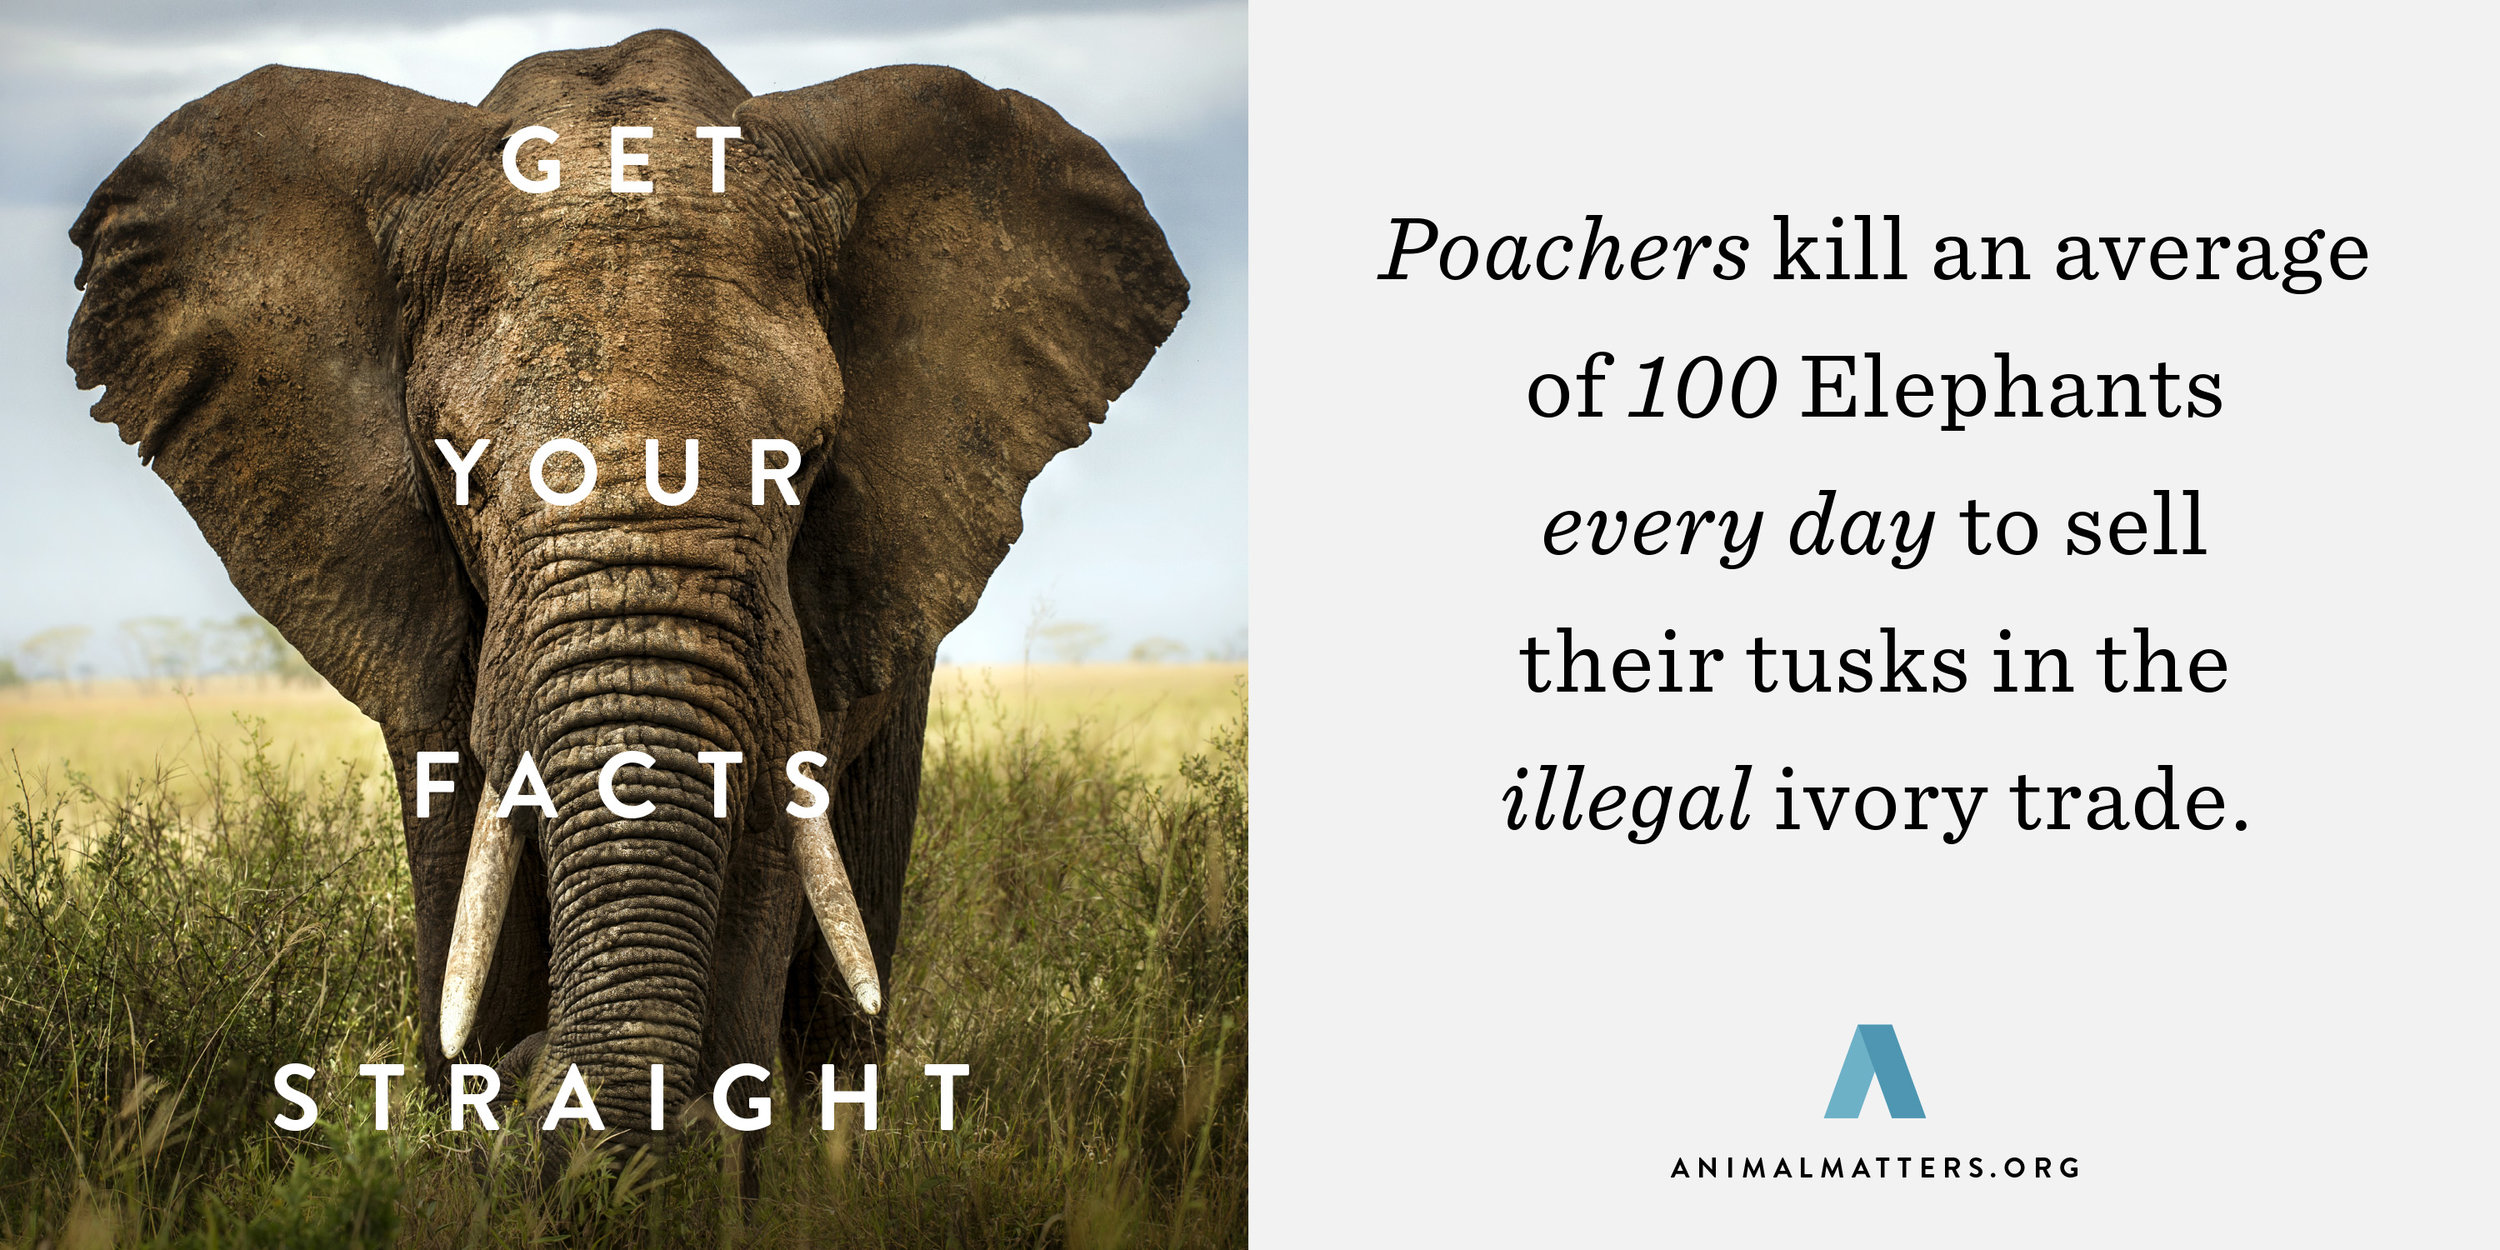 Elephant-Poaching-Statistic.jpg